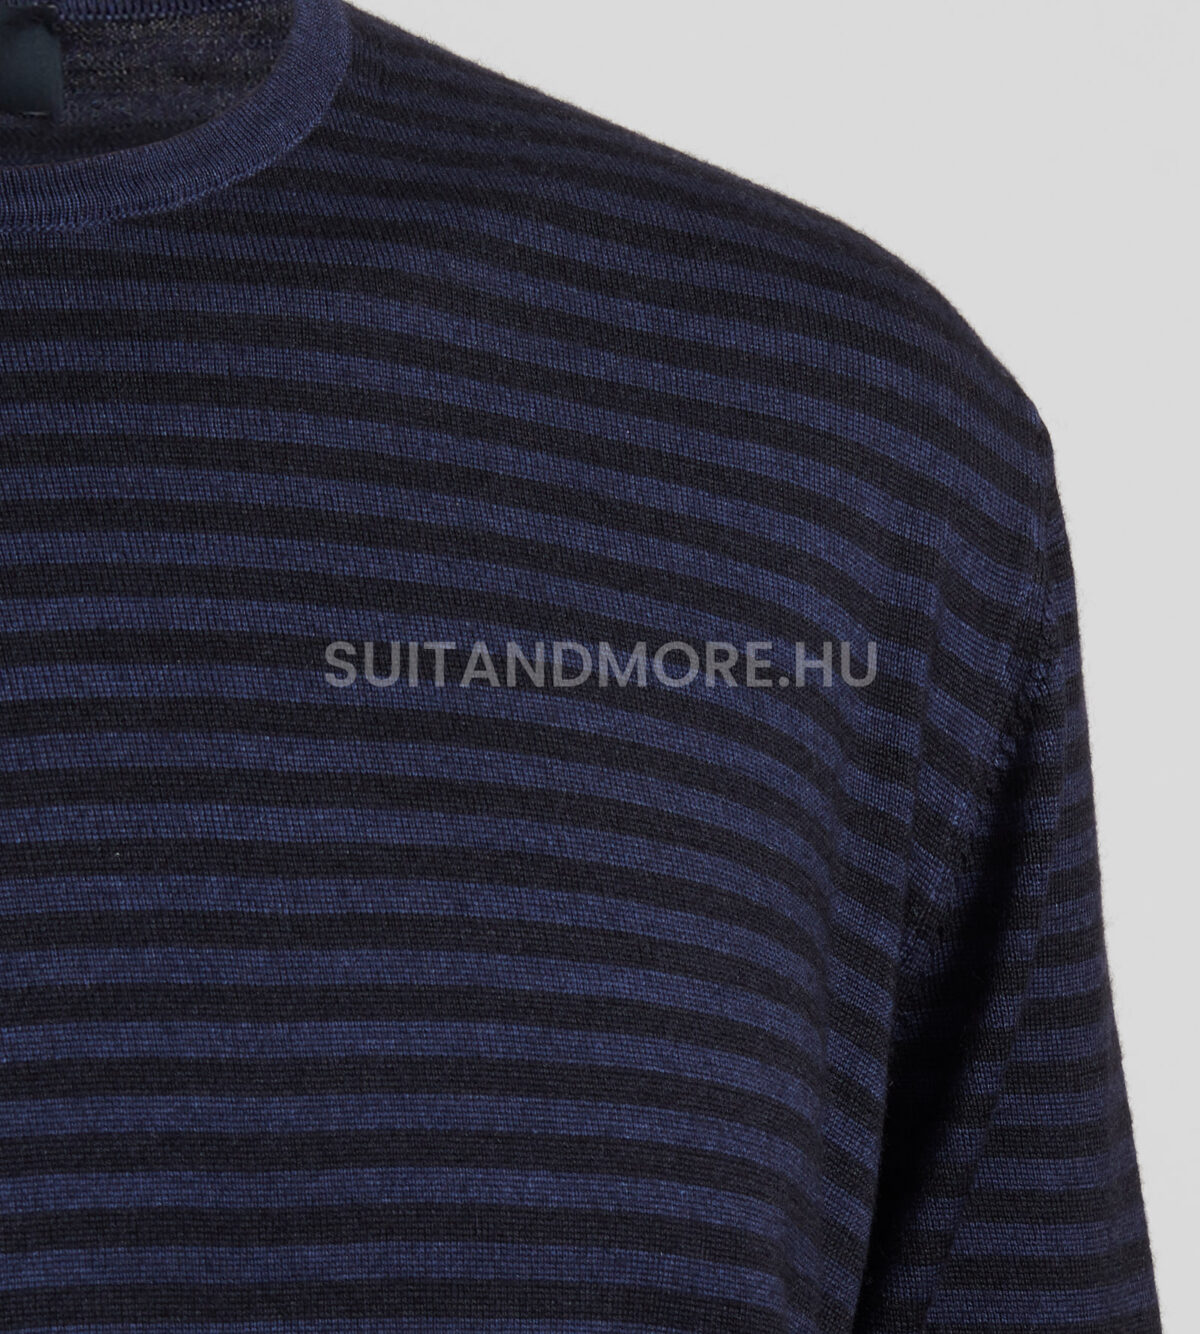 digel-sotetkek-slim-fit-kerek-nyaku-csikos-gyapju-pulover-asa1-1-1288014-20-02